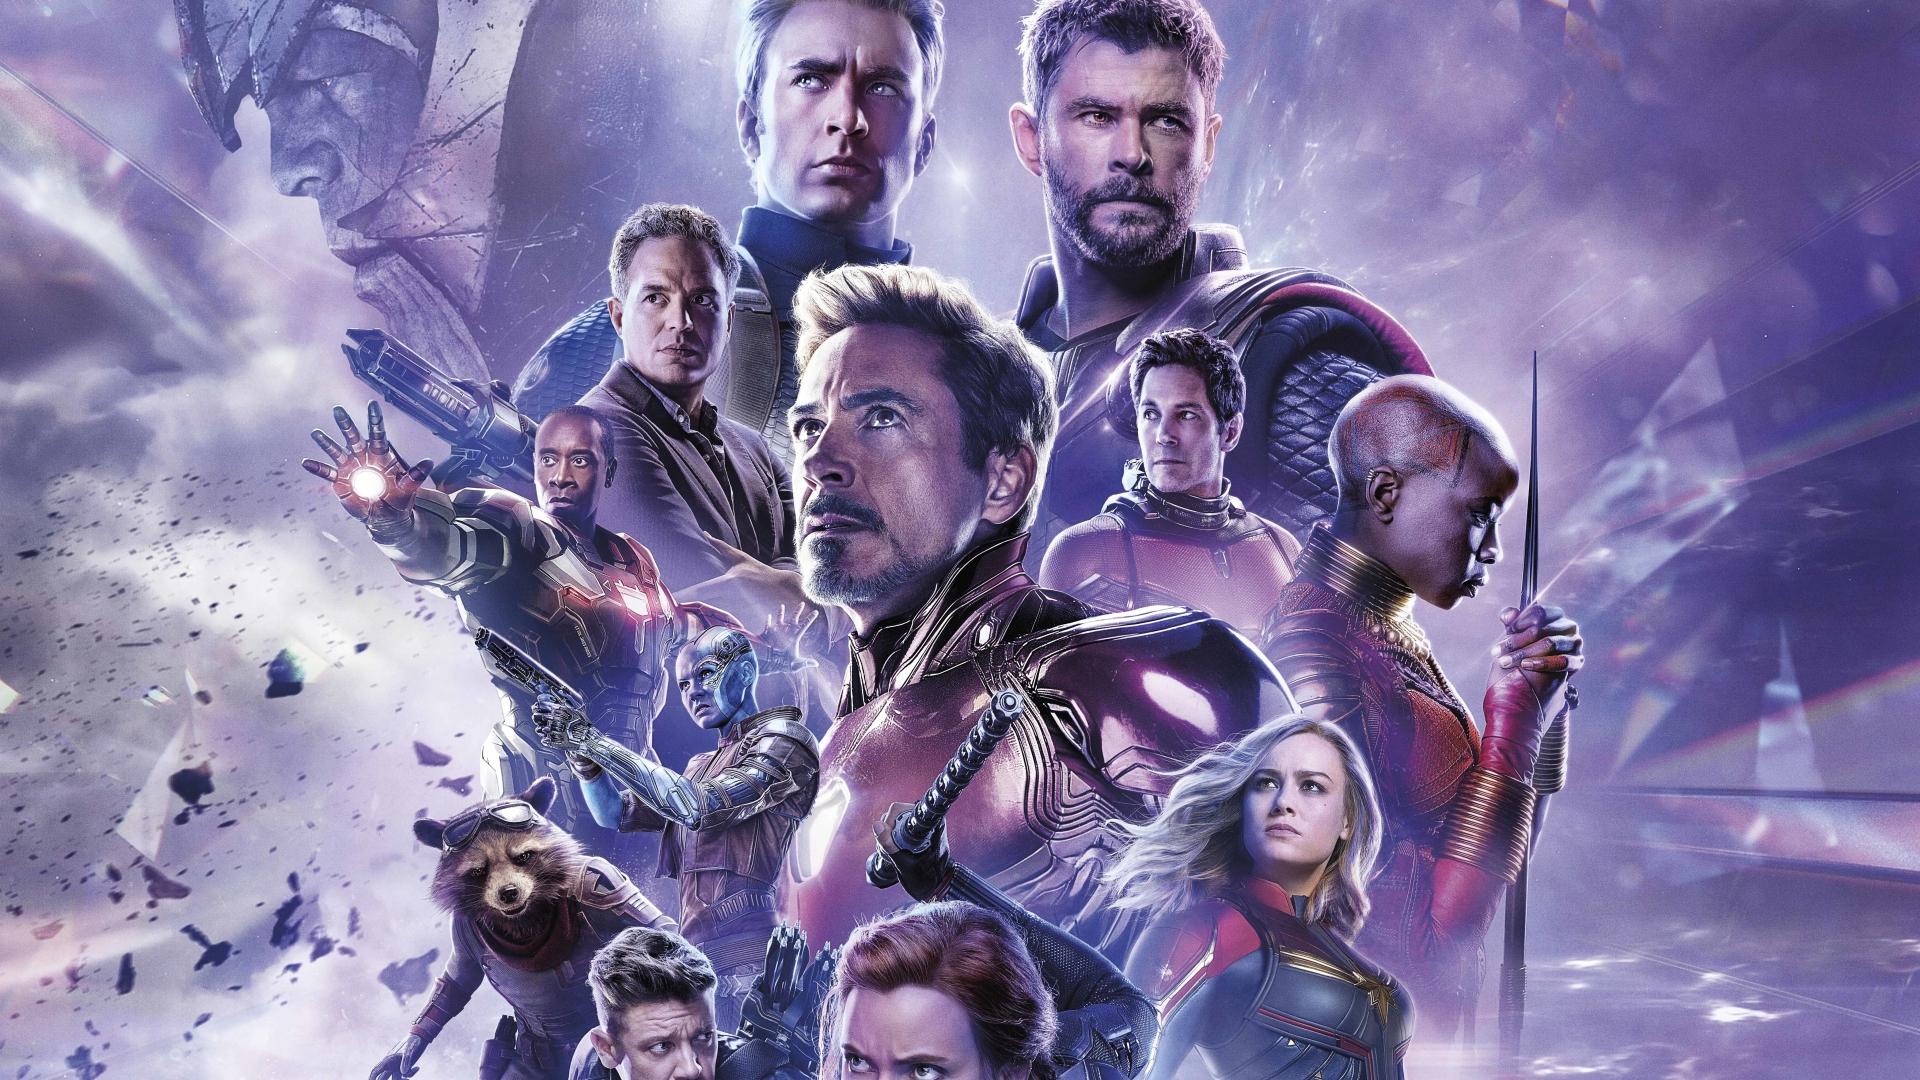 1920x1080 Avengers Endgame 8k Russian Poster 1080p Laptop